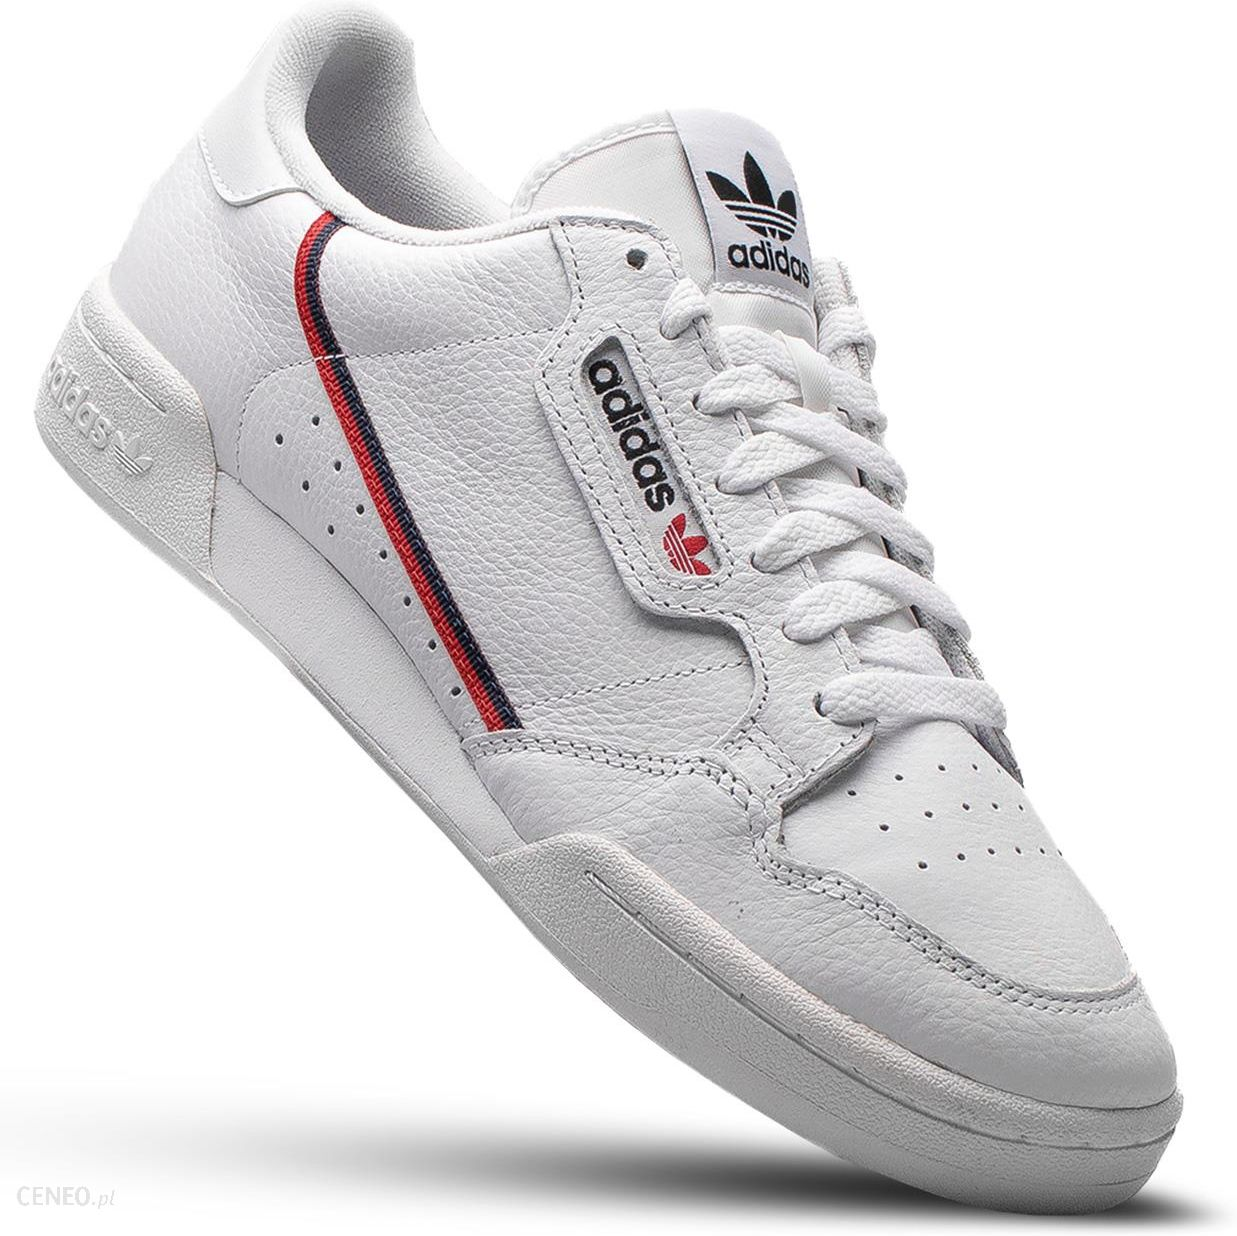 Buty adidas CONTINENTAL 80 G27706 (44) Ceny i opinie Ceneo.pl